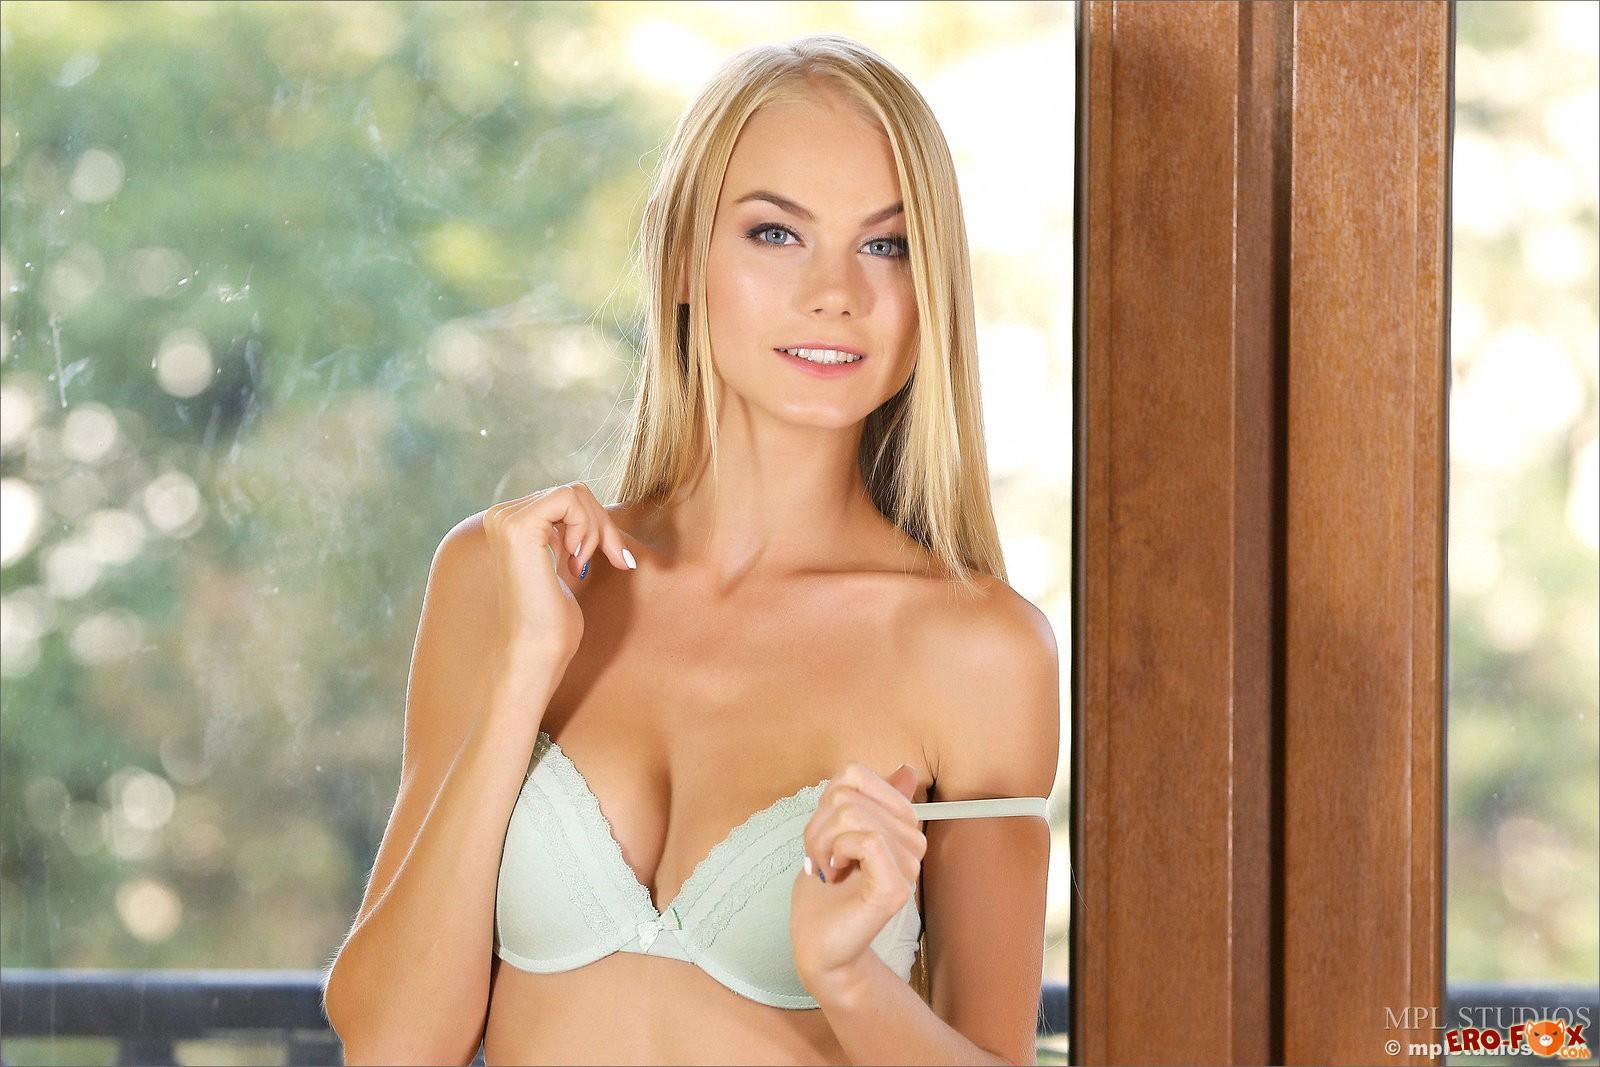 Блондинка снимает трусики и лифчик